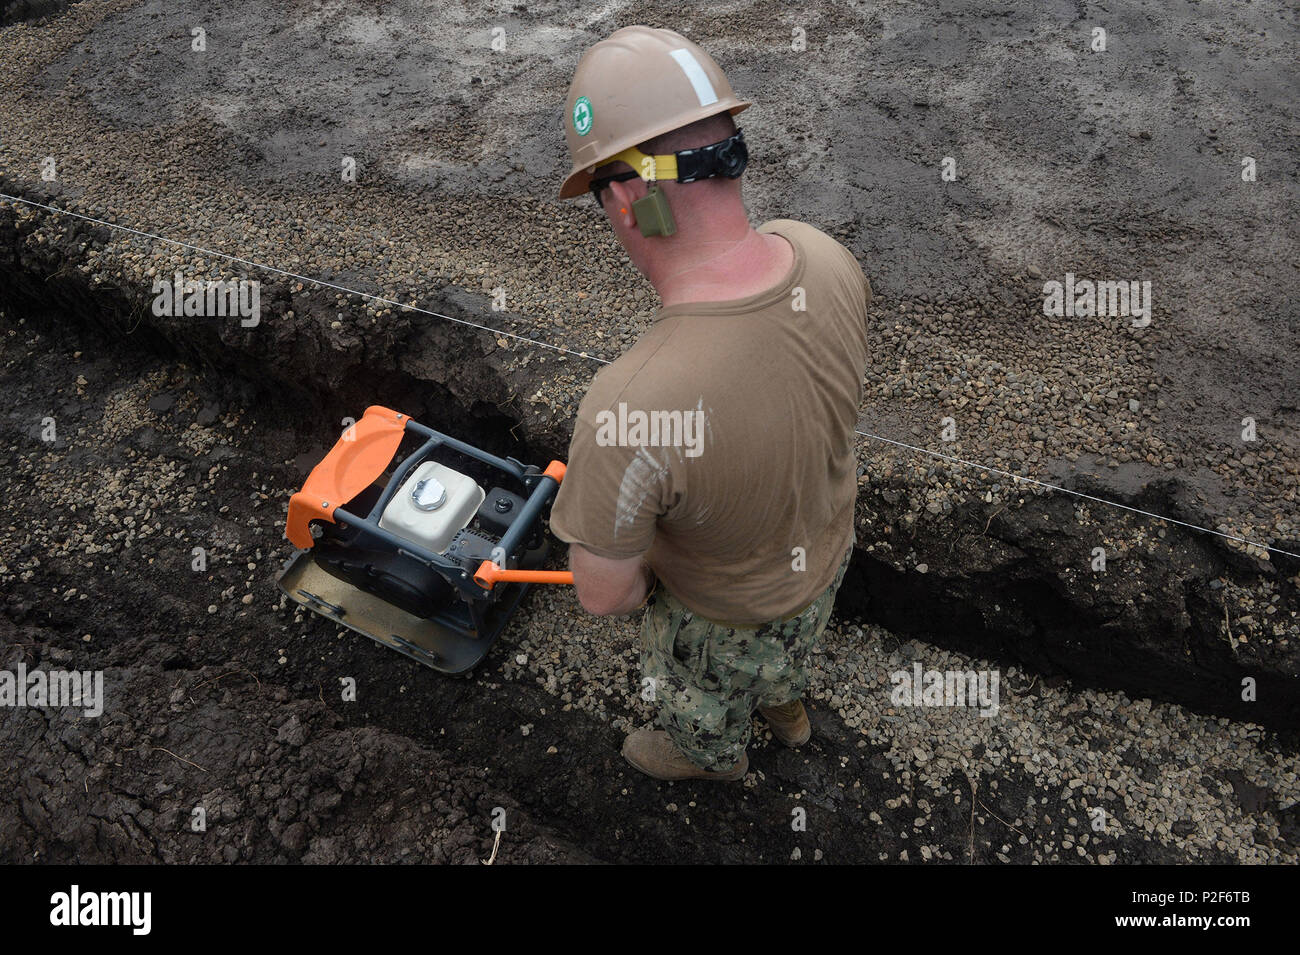 Gravel Base Stock Photos & Gravel Base Stock Images - Alamy